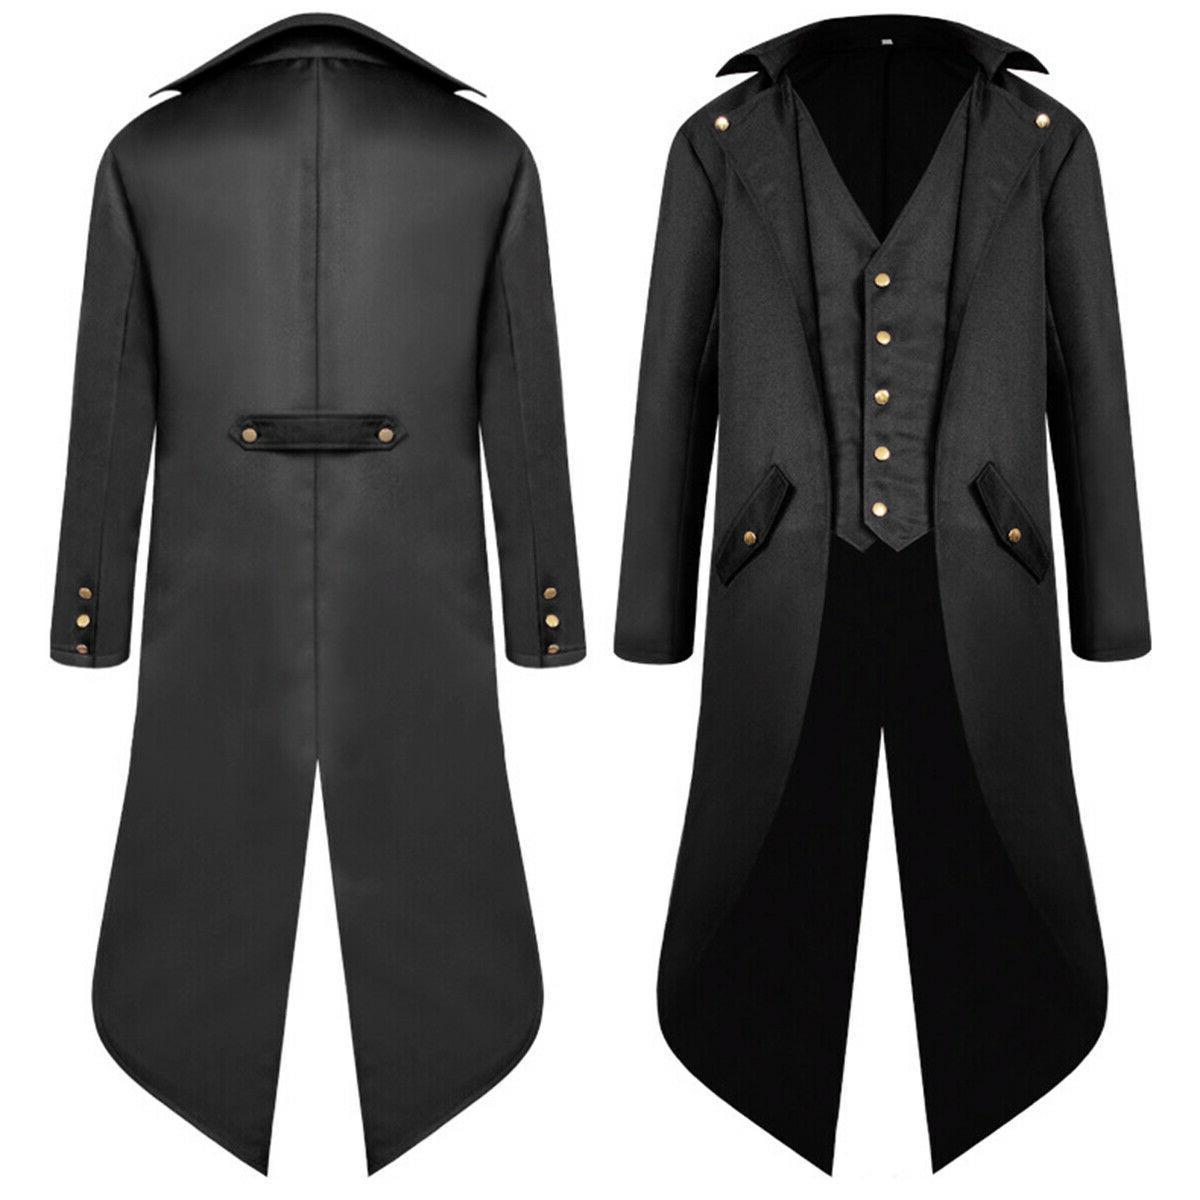 Mens Coat Tuxedo Banquet Tail